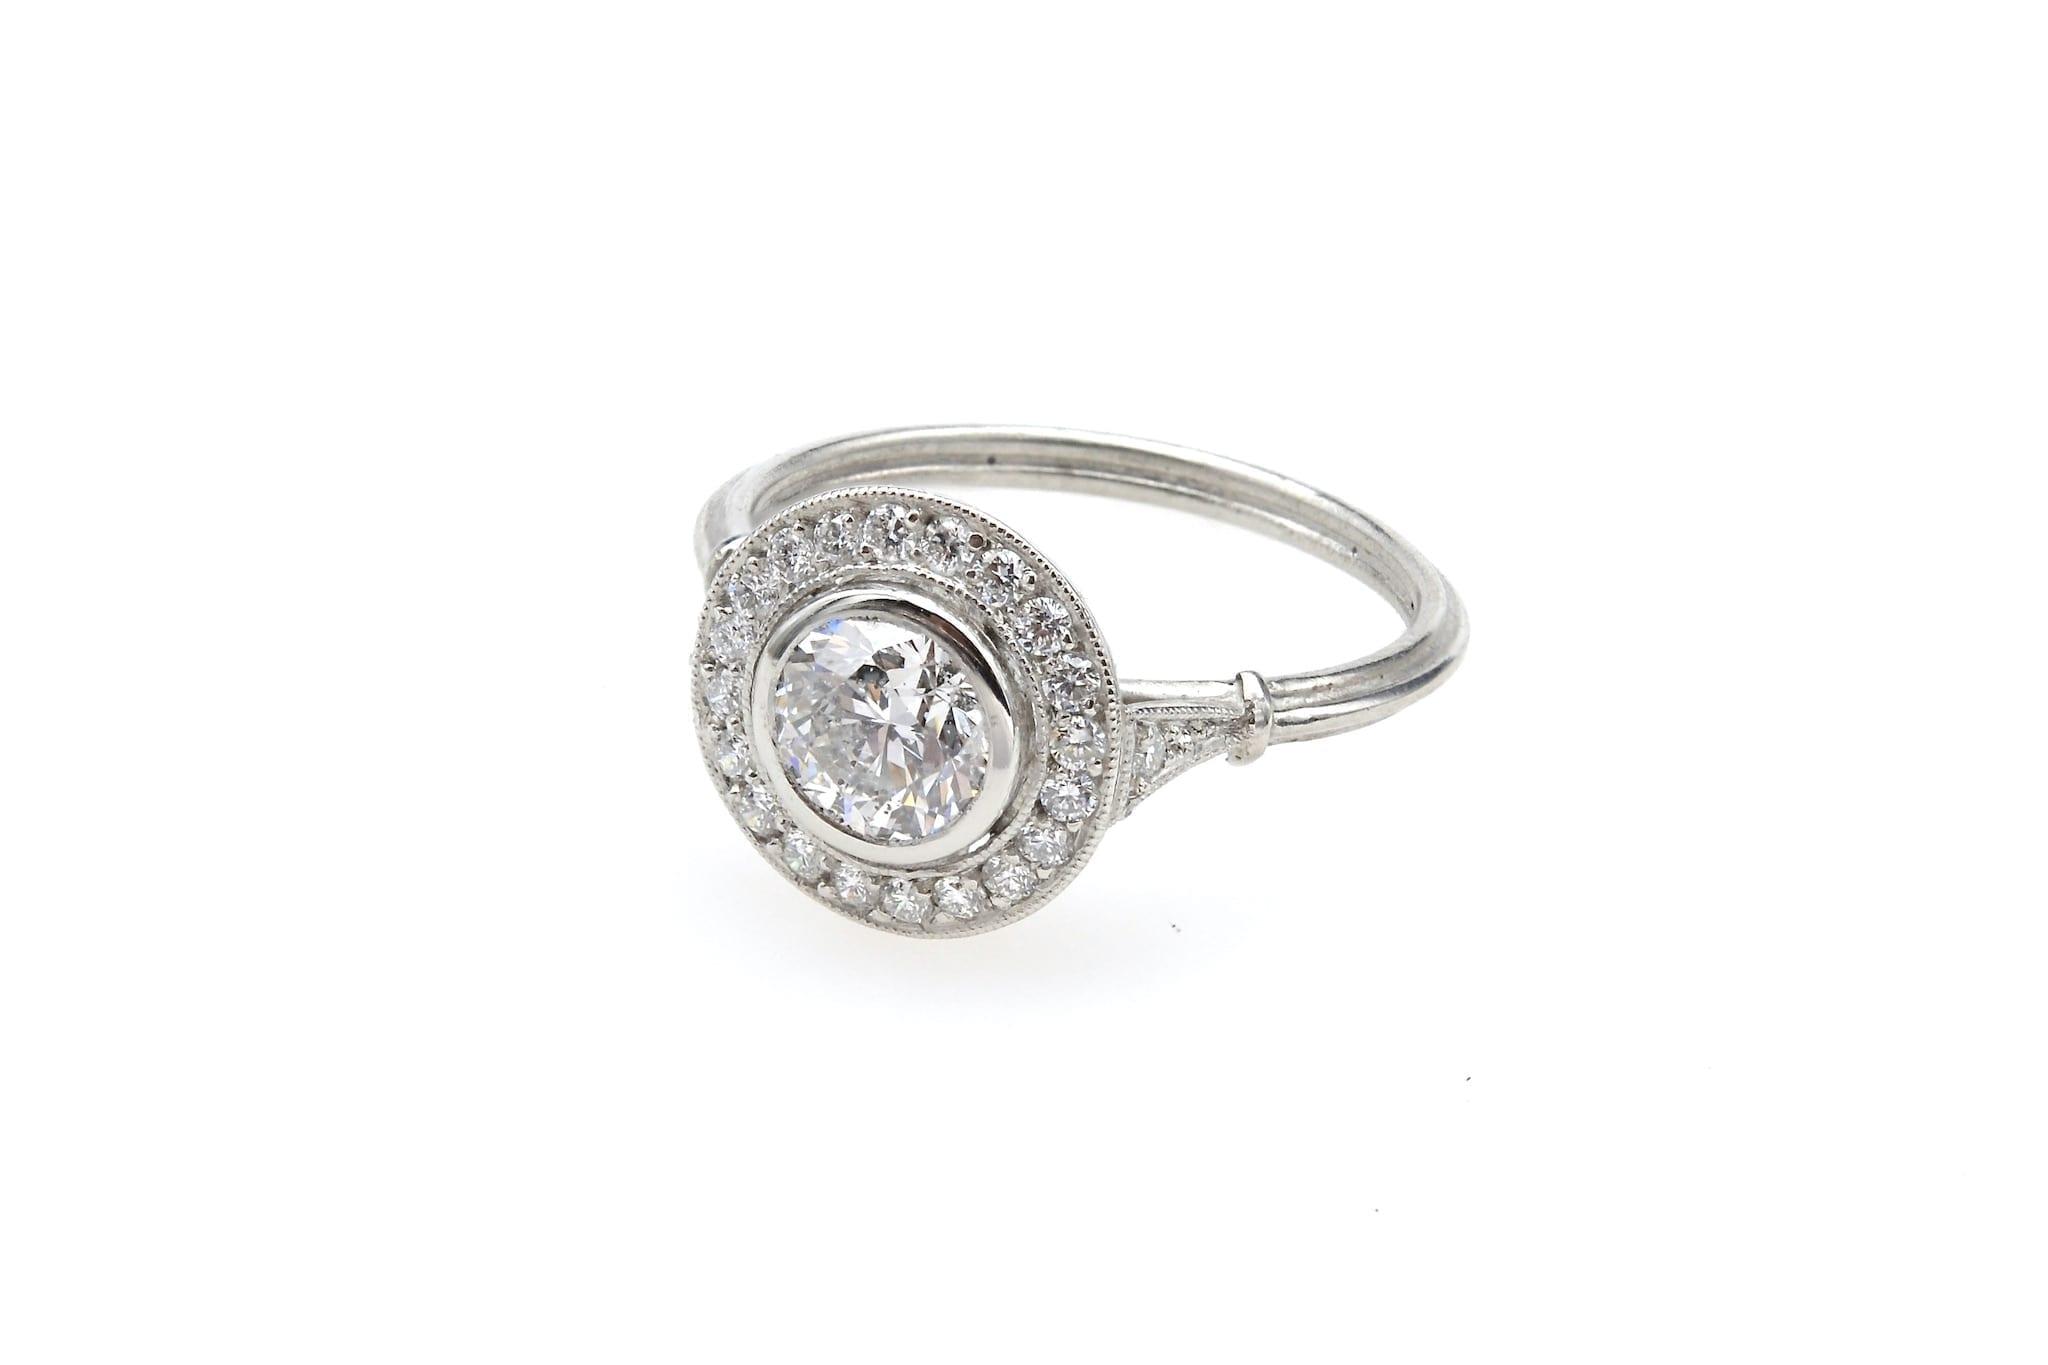 Bague ronde diamants entourage en platine